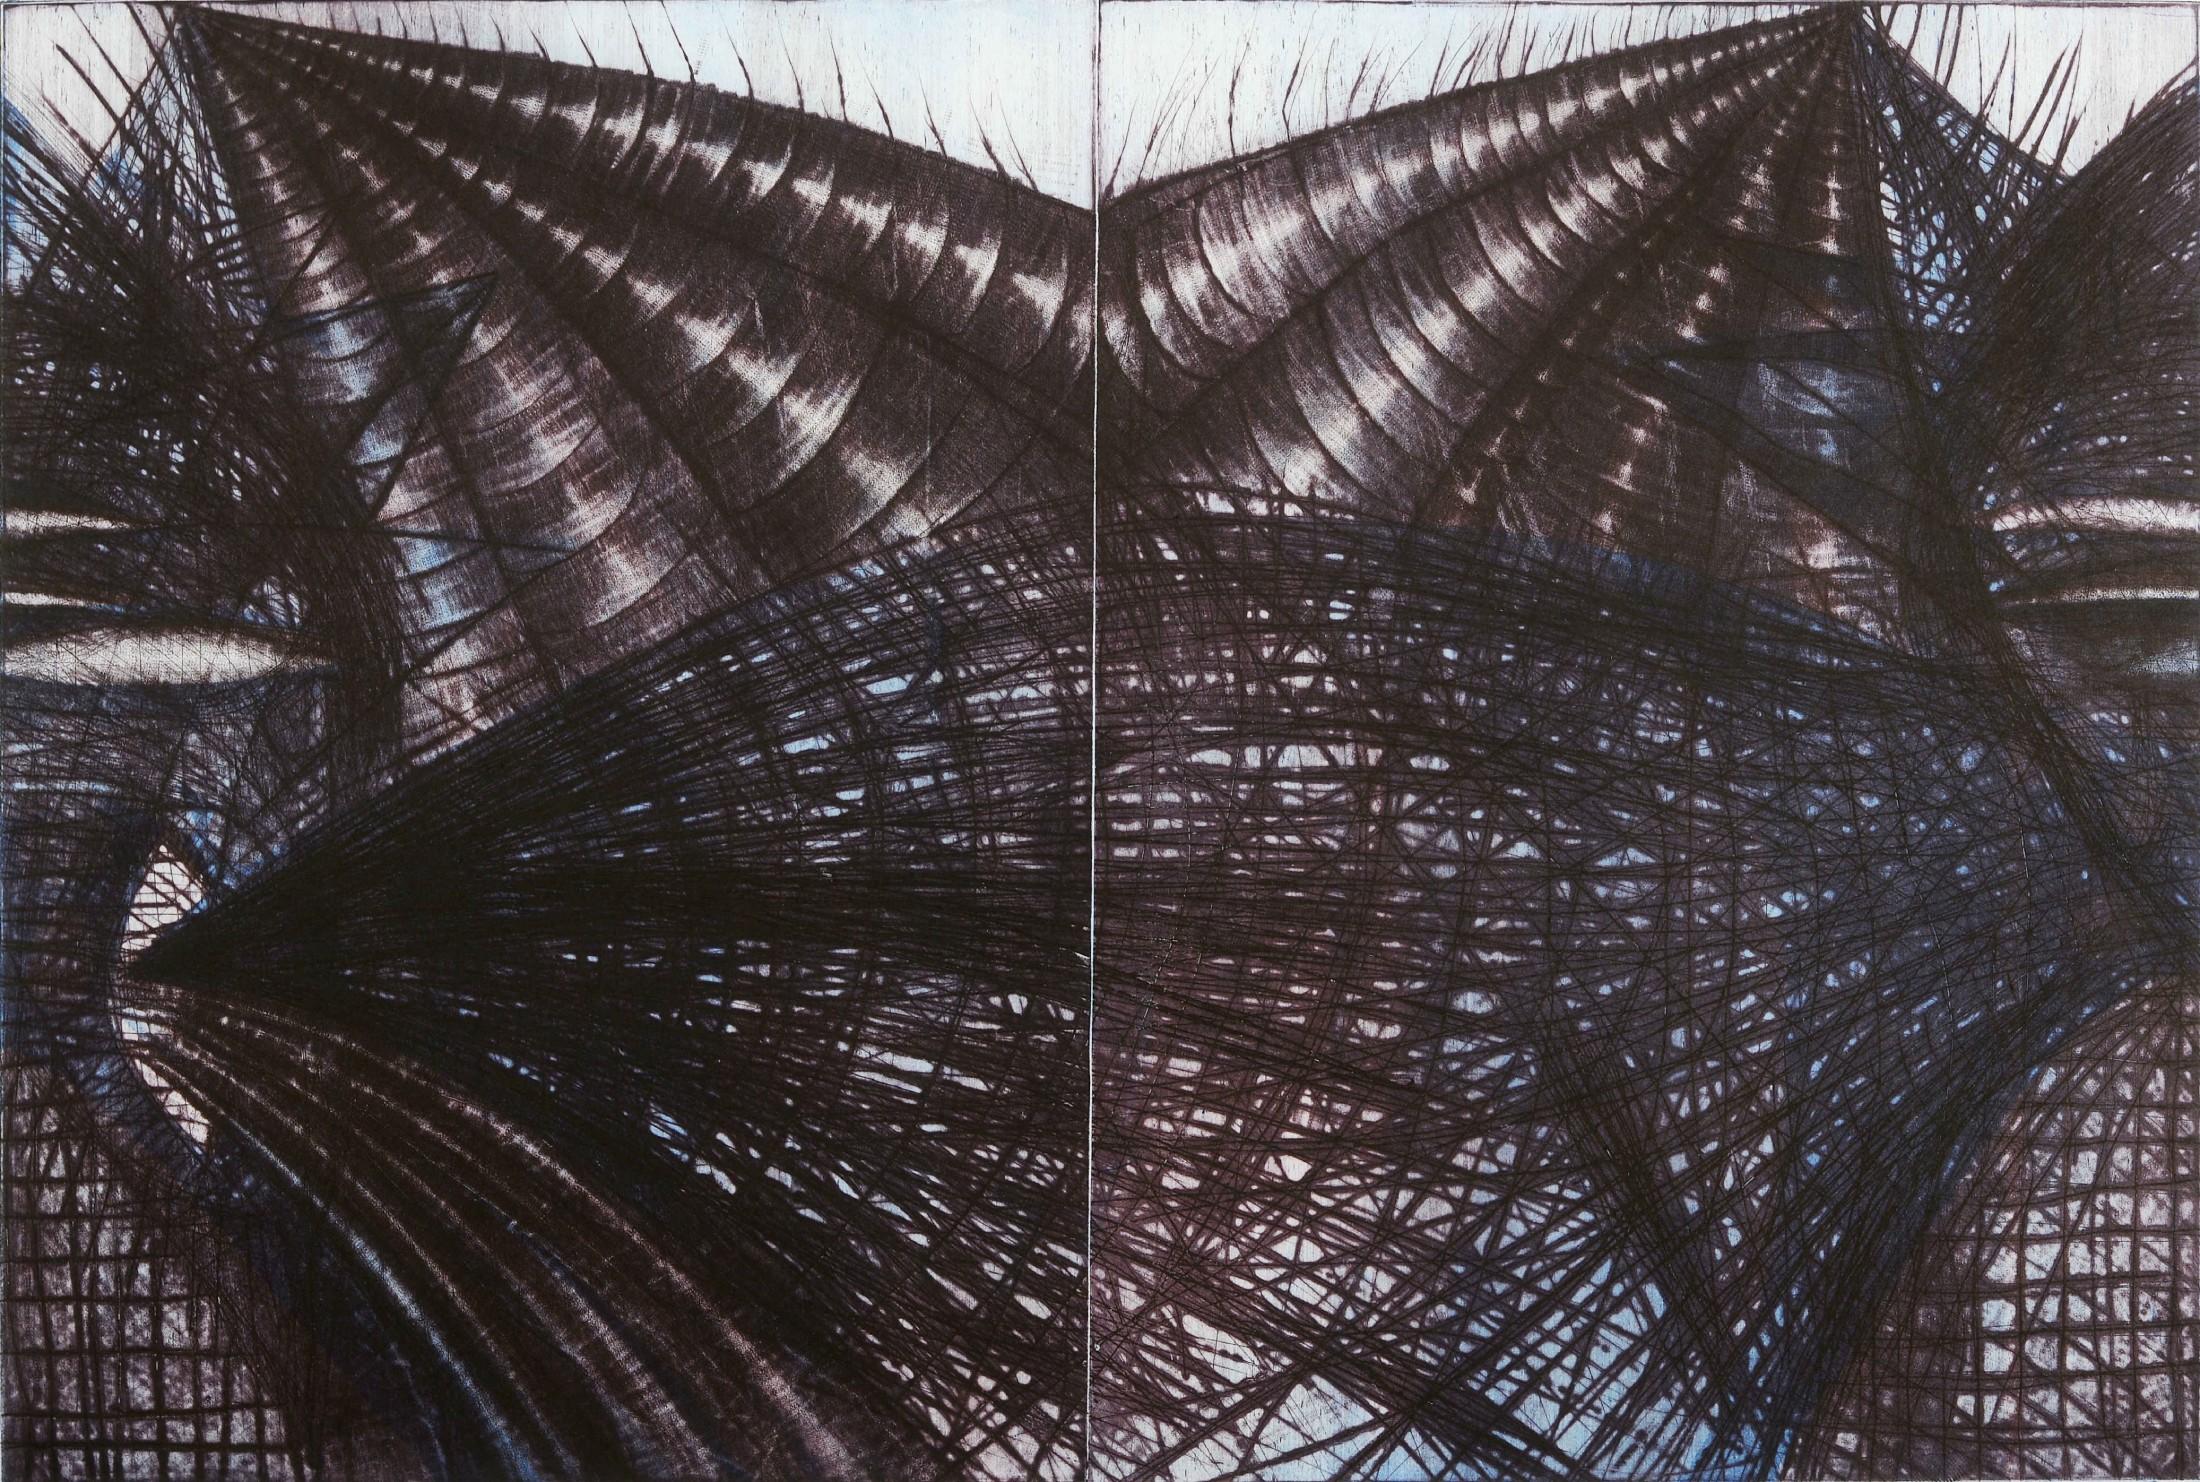 Transmitation (AB), 1988